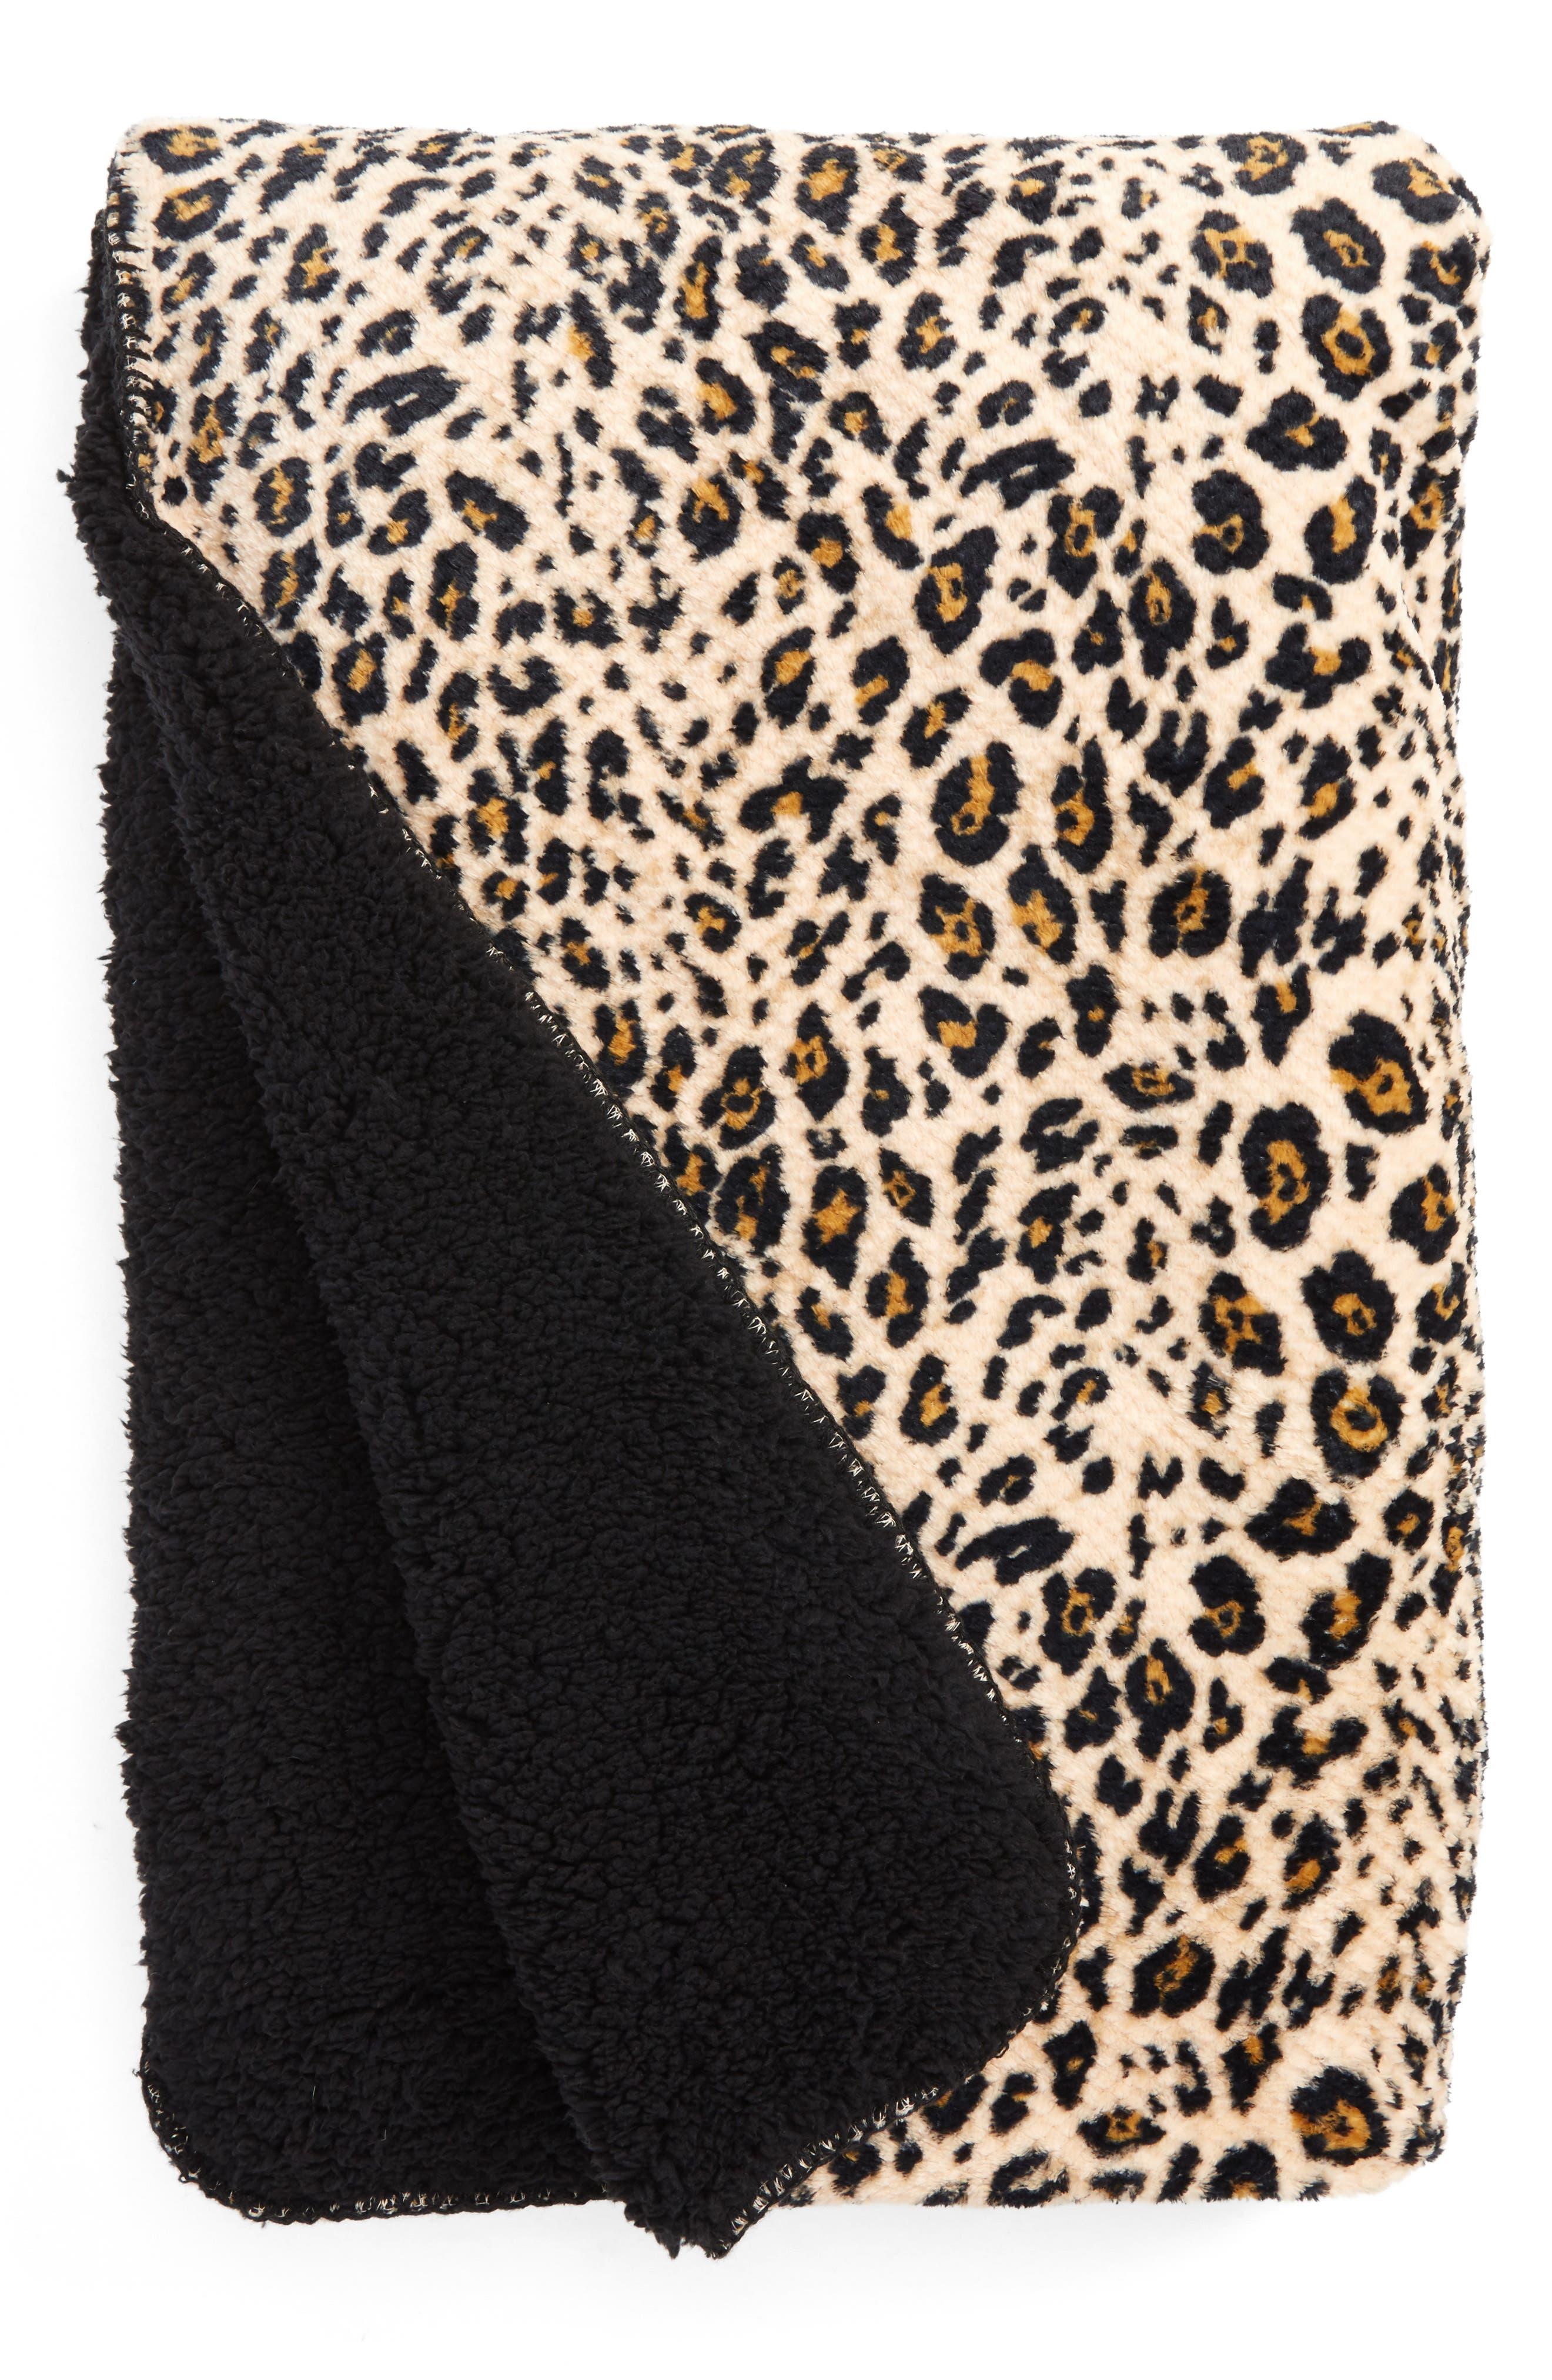 PJ Salvage Leopard Print Faux Shearling Blanket